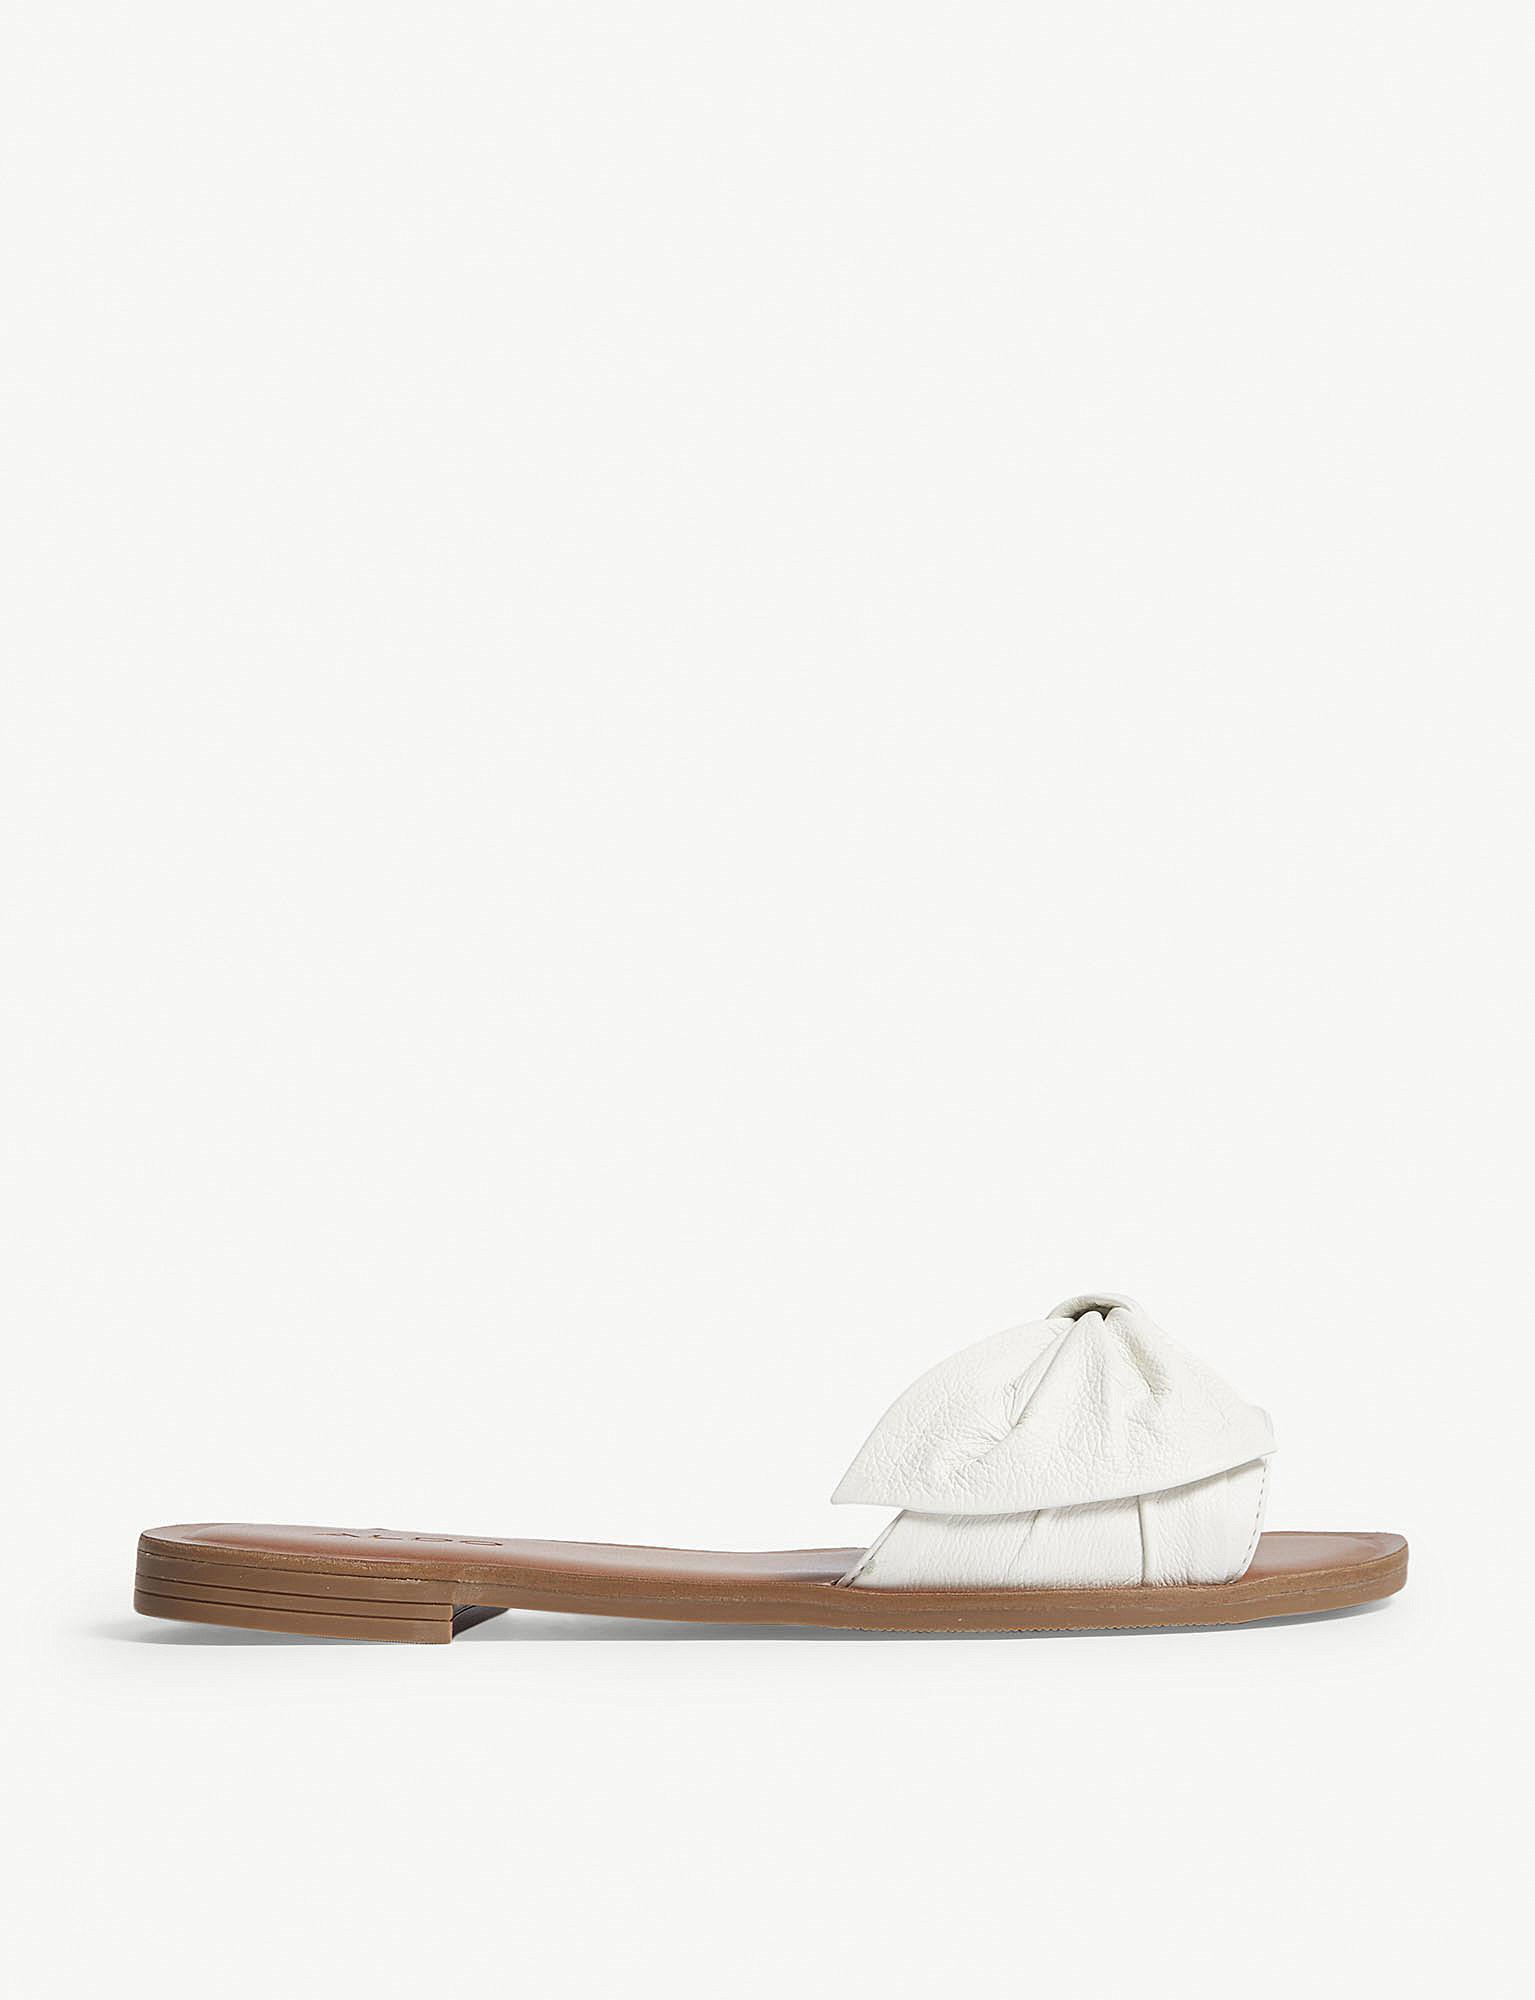 c1d5d3e9be9b ALDO Enroelia Flat Sandals in White - Lyst